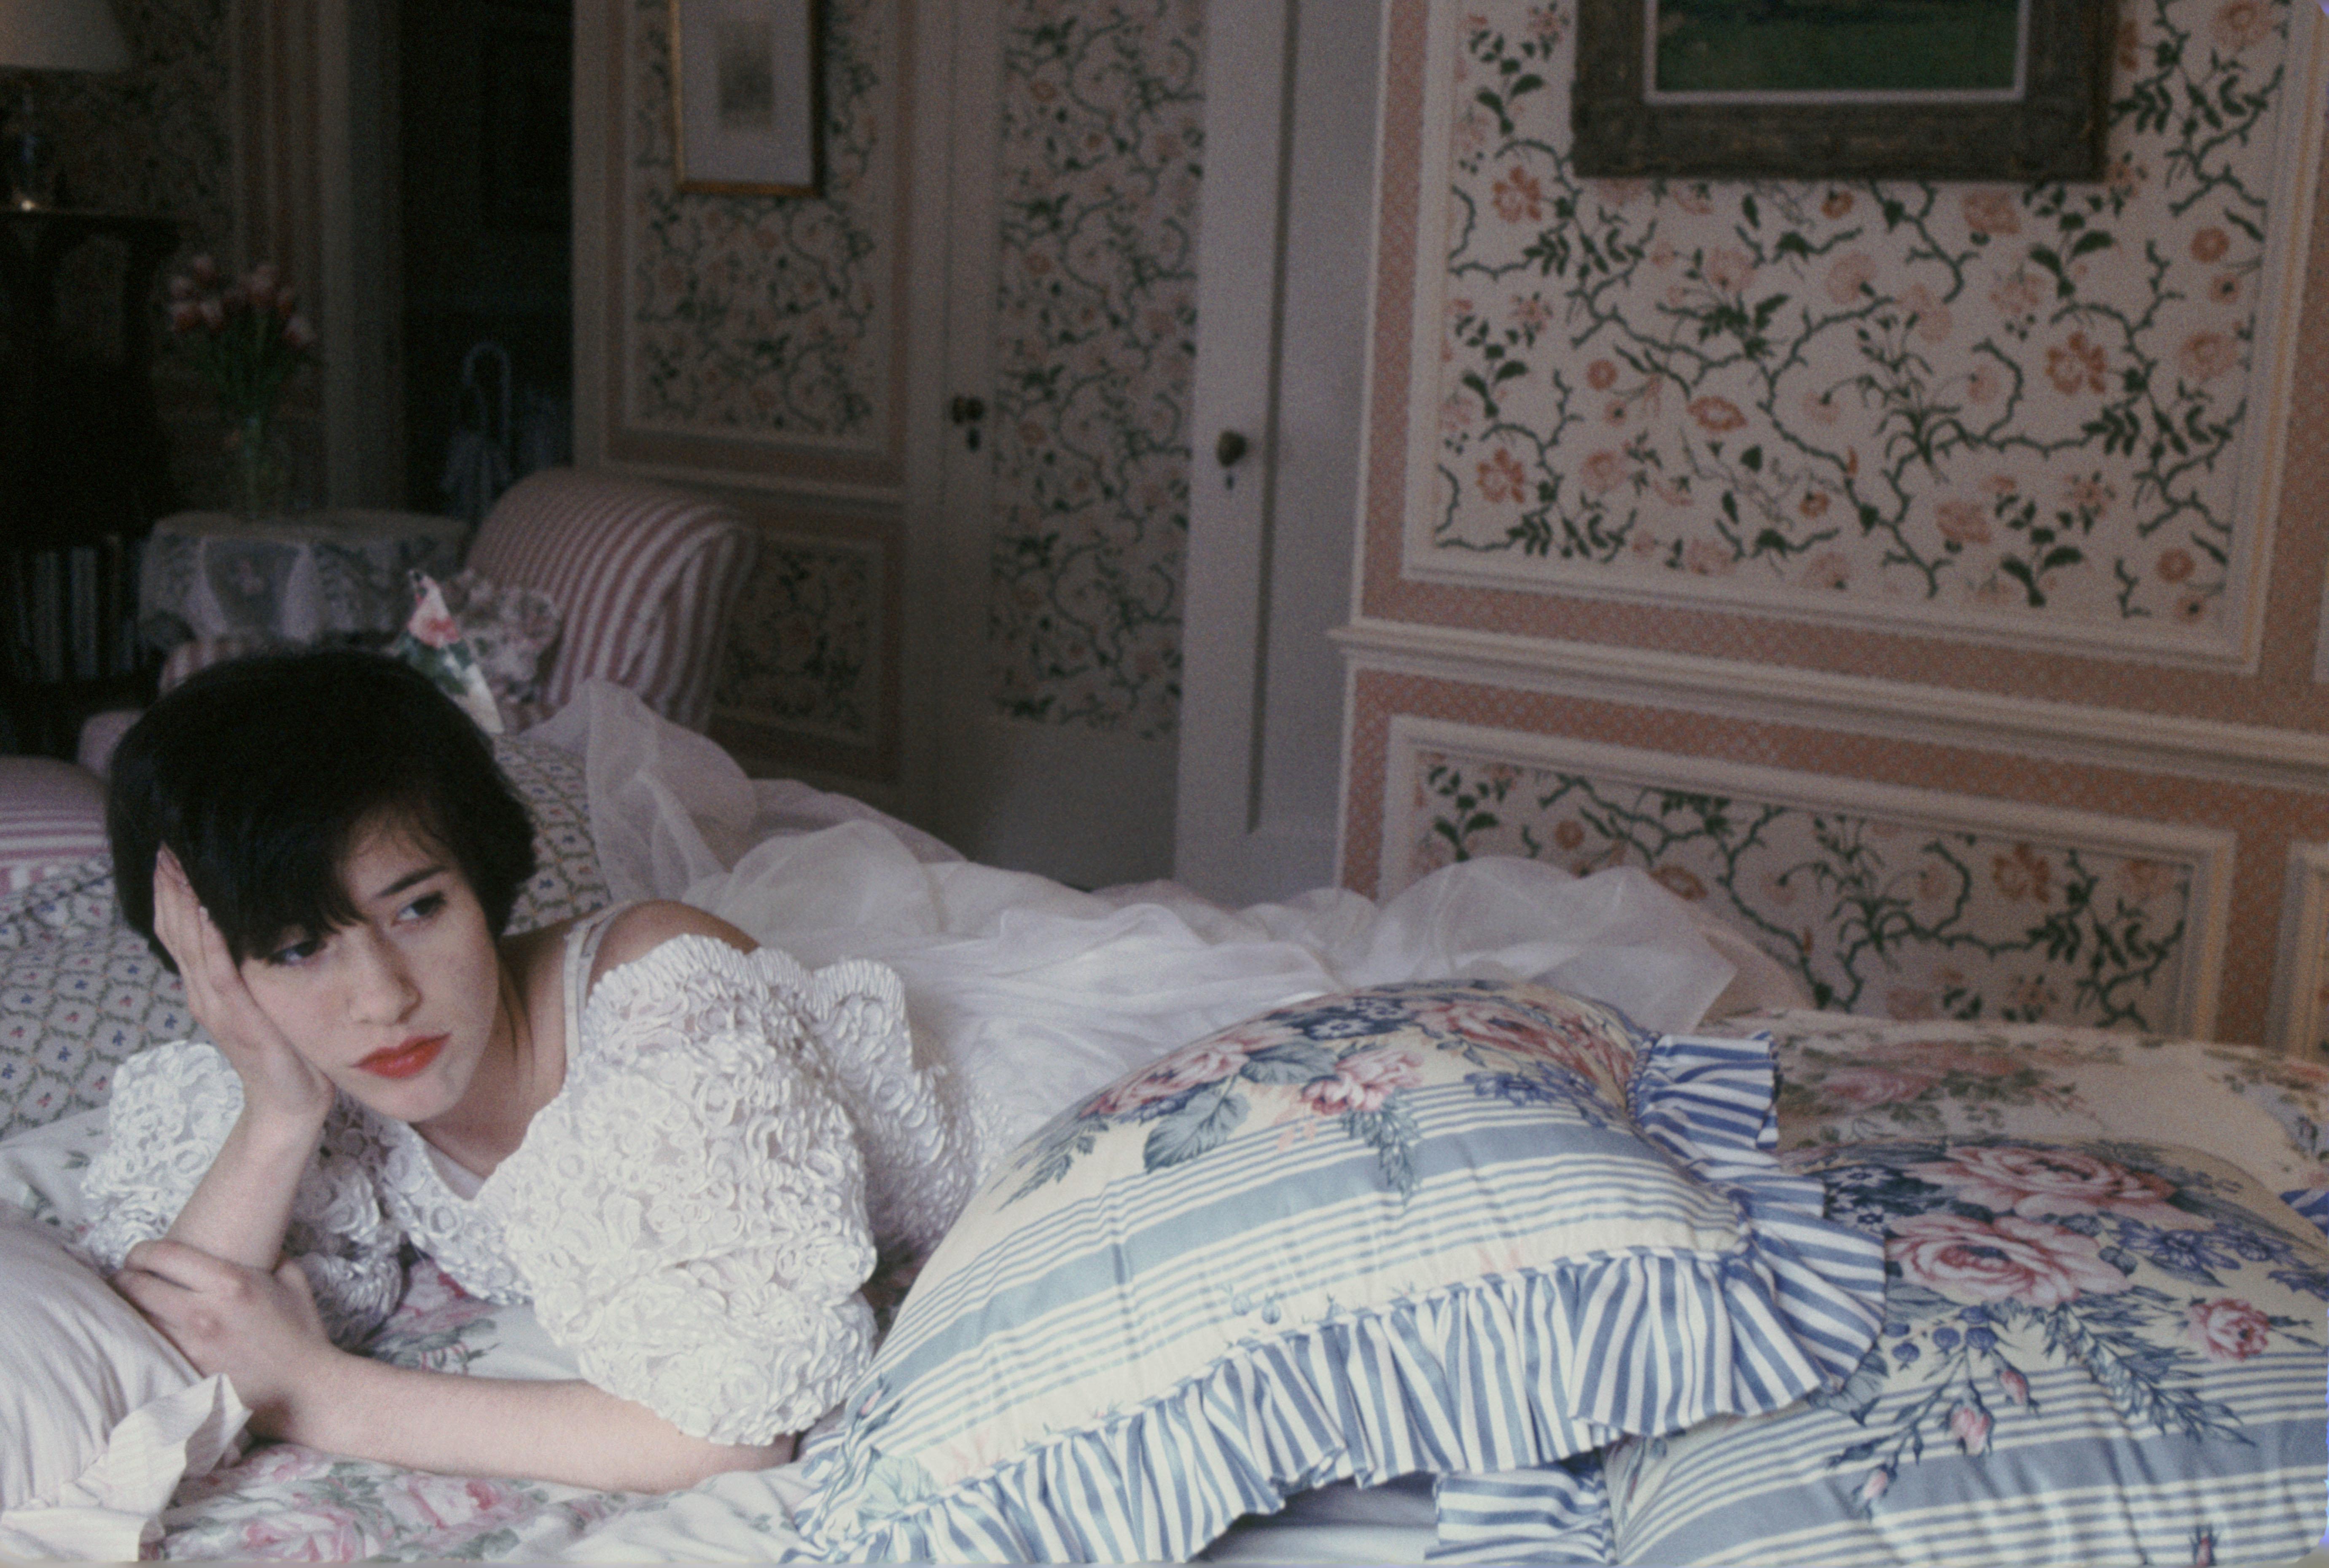 Anne Lockhart (actress),Hylda Queally Erotic videos Imaan Hammam NED 1 2014,Brendan Beiser